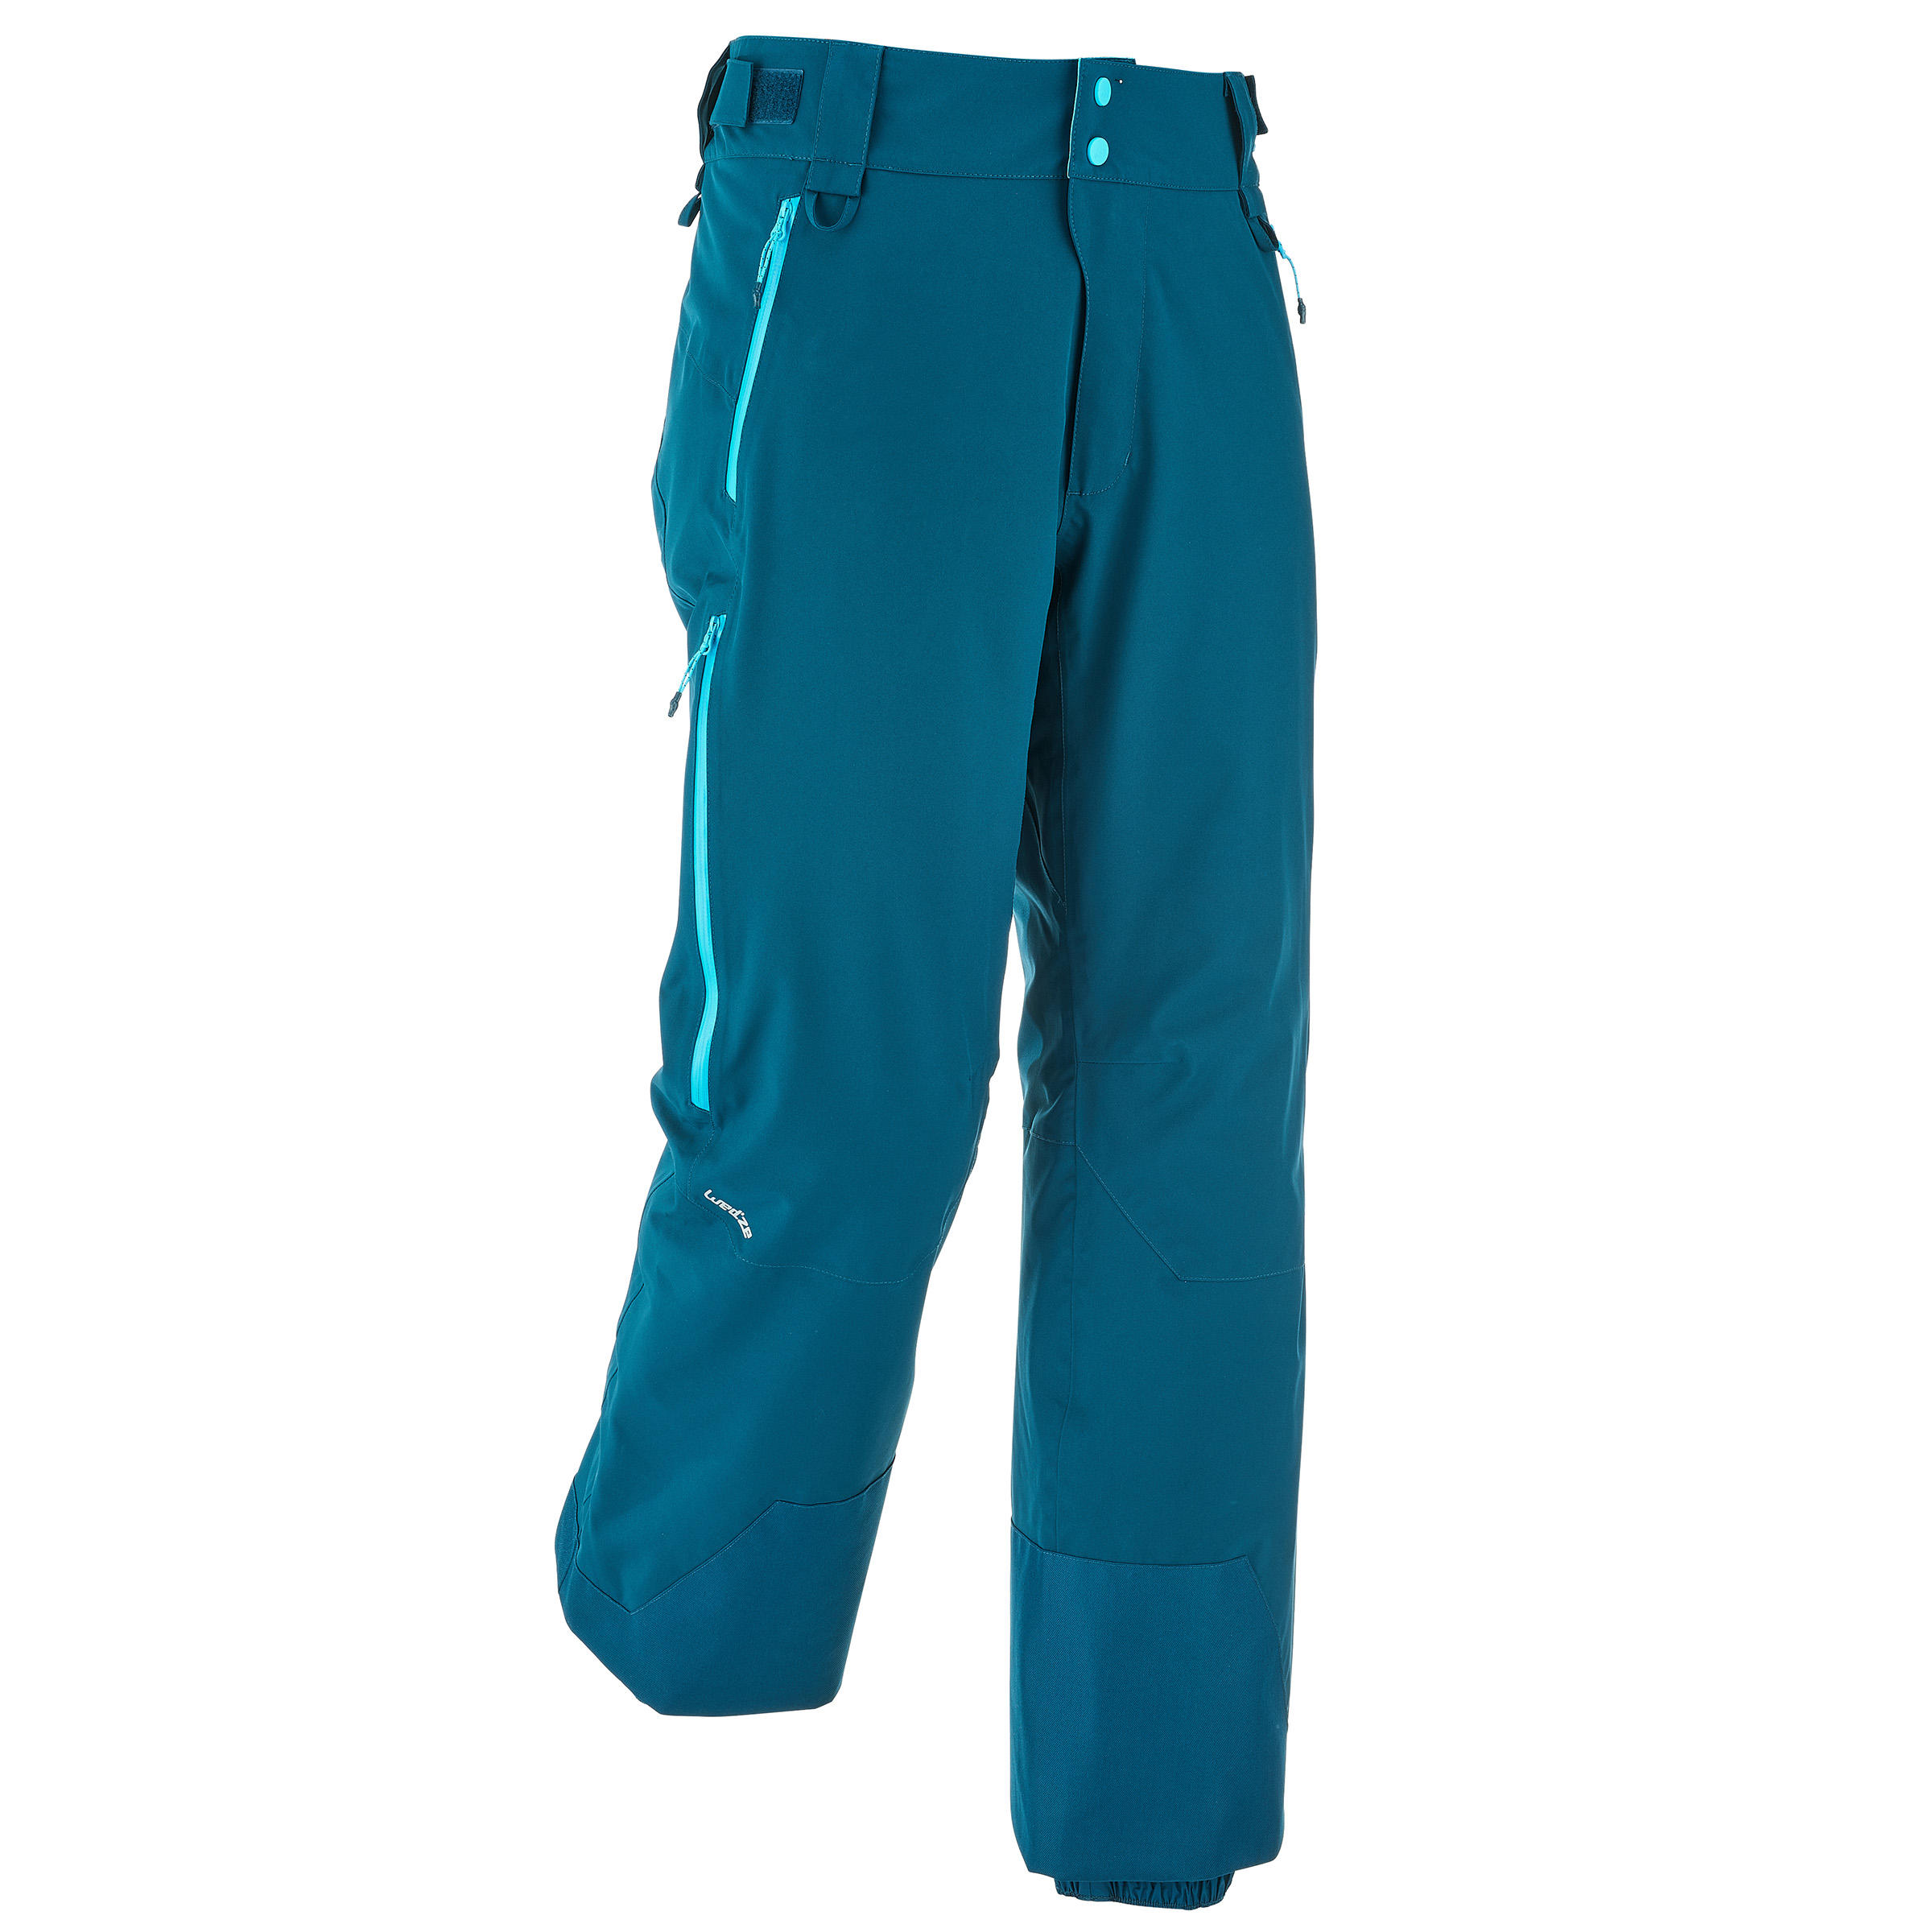 Pantalon de ski tout-terrain homme free 500 pétrole